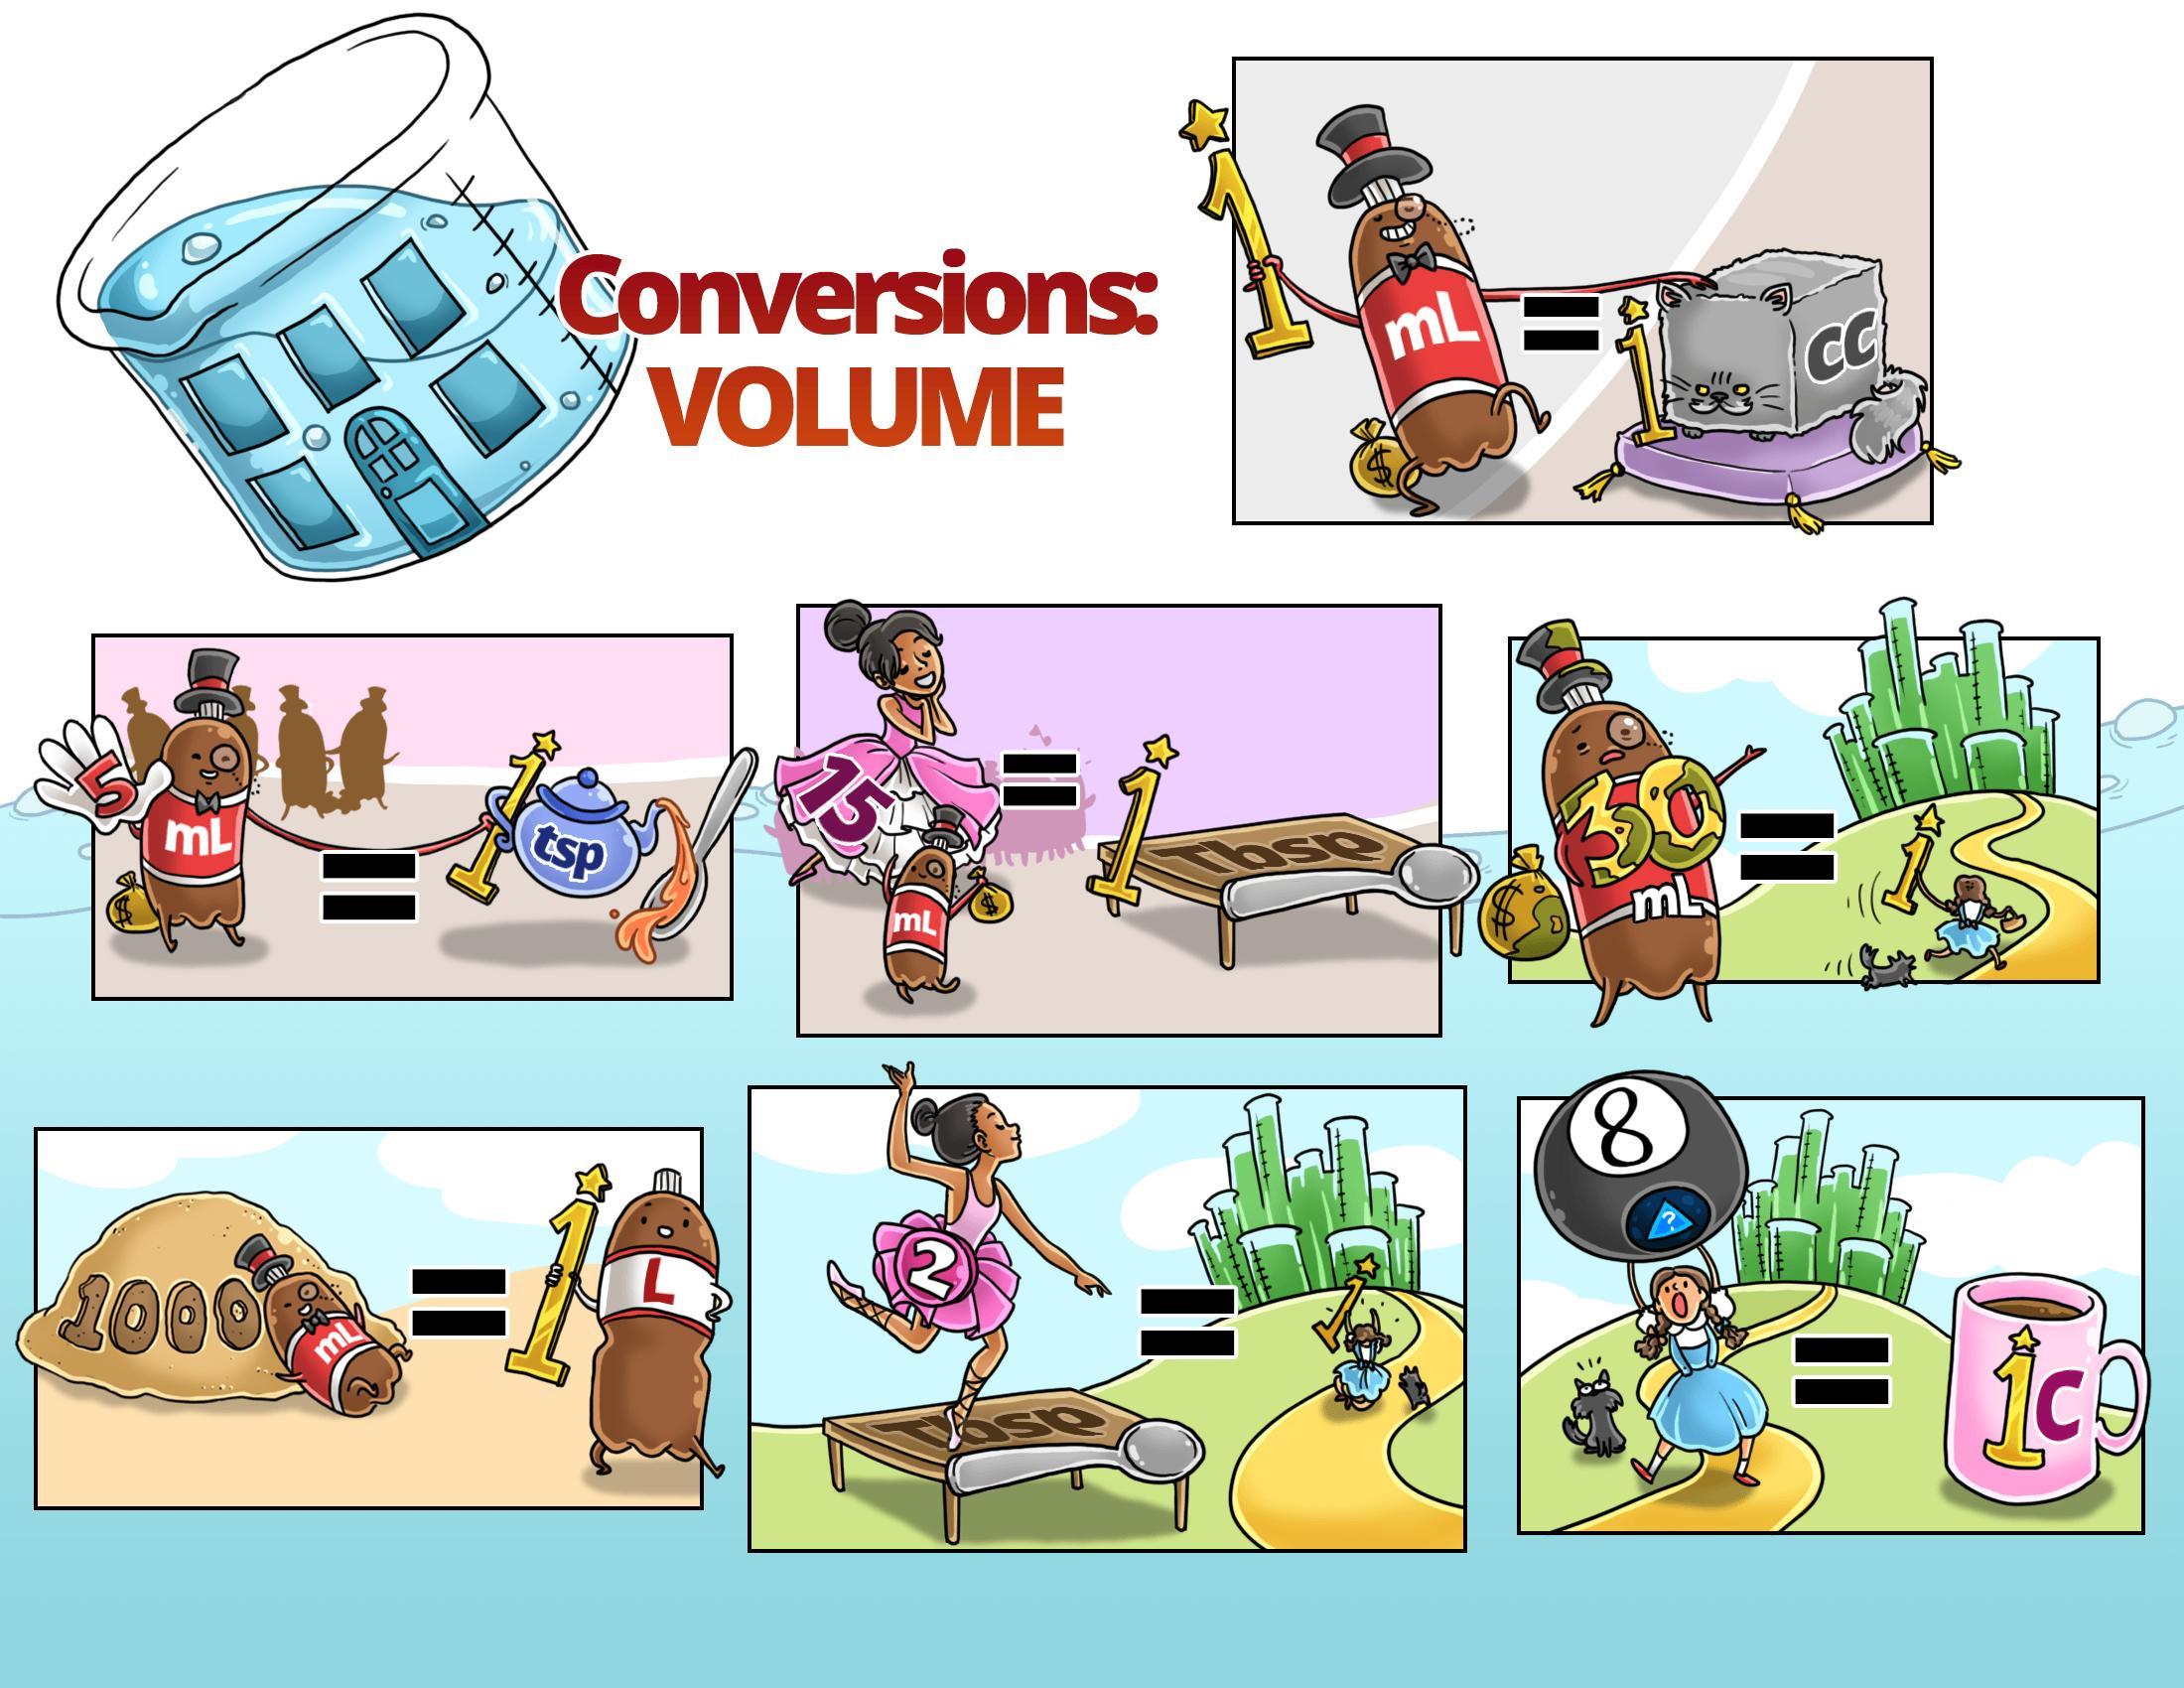 Conversions: Volume